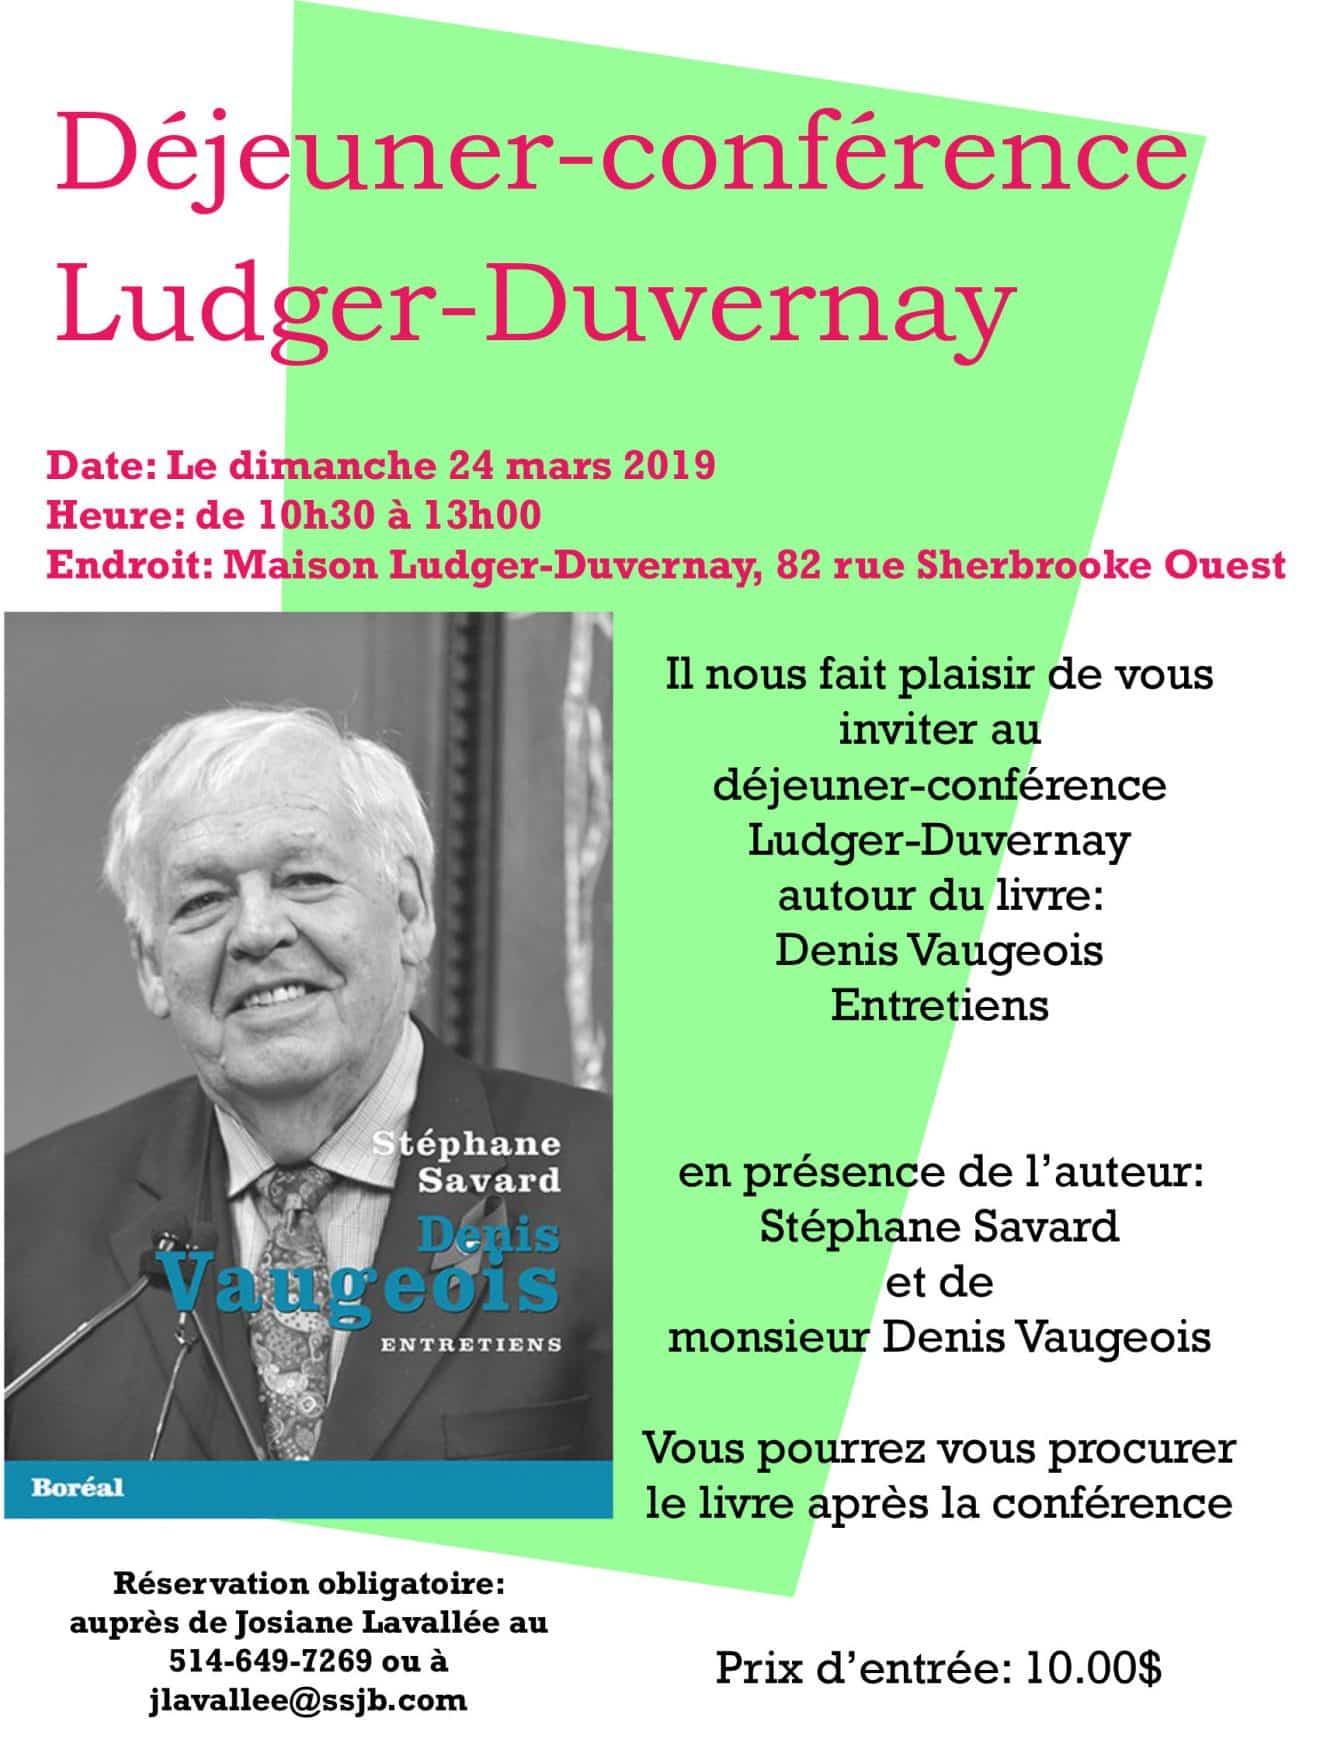 Déjeuner-conférence Stéphane Savard